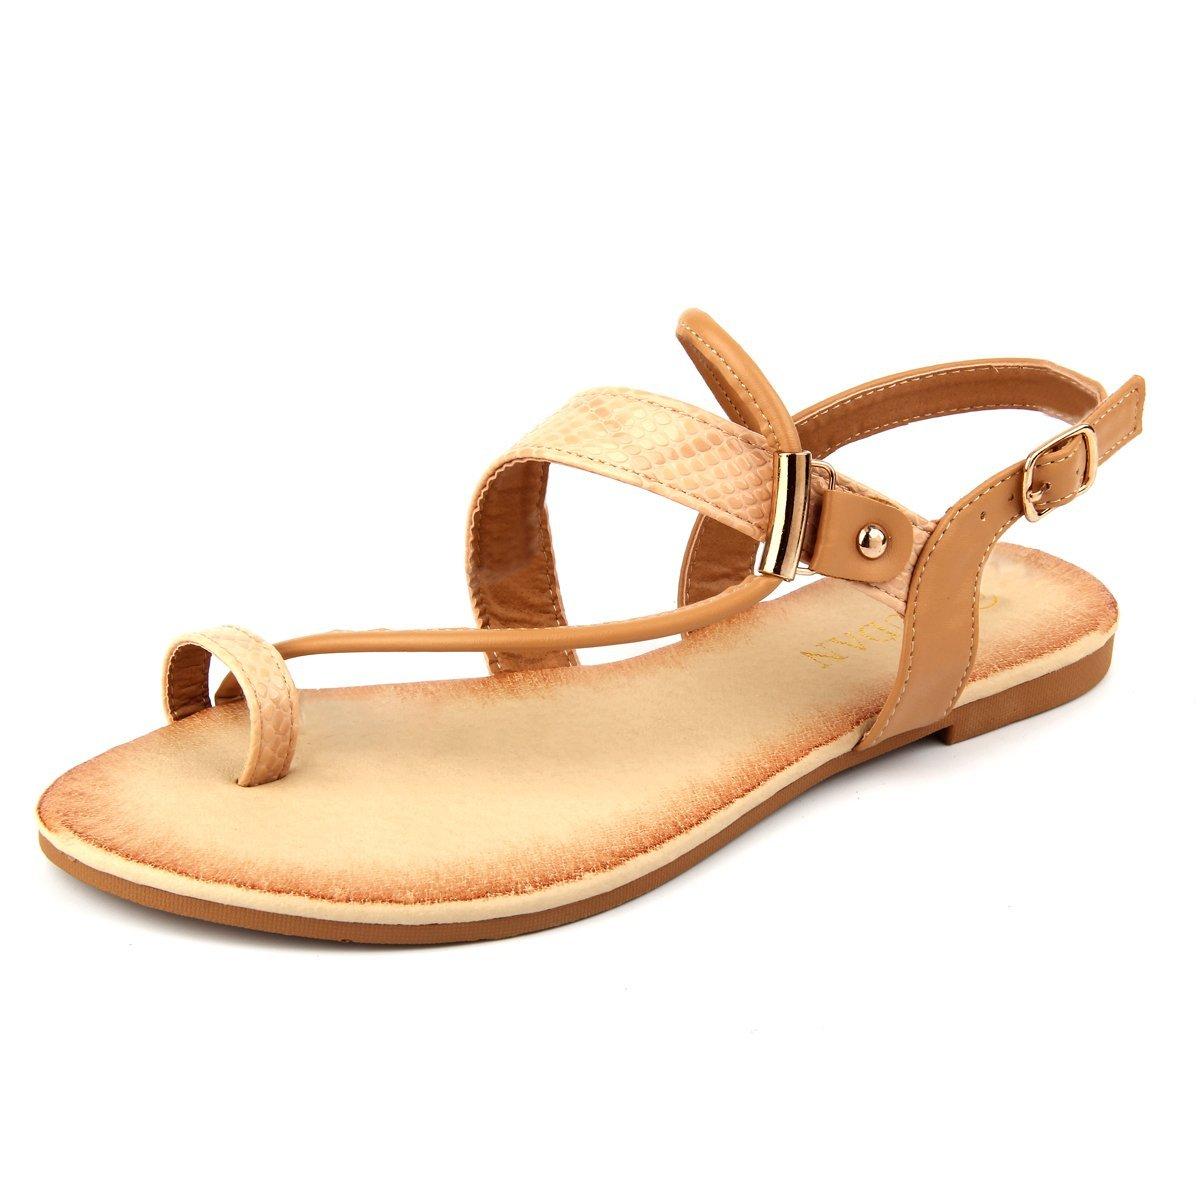 MuDan Thong Flat Gladiator Summer Sandals (5 B (M) US, Beige)